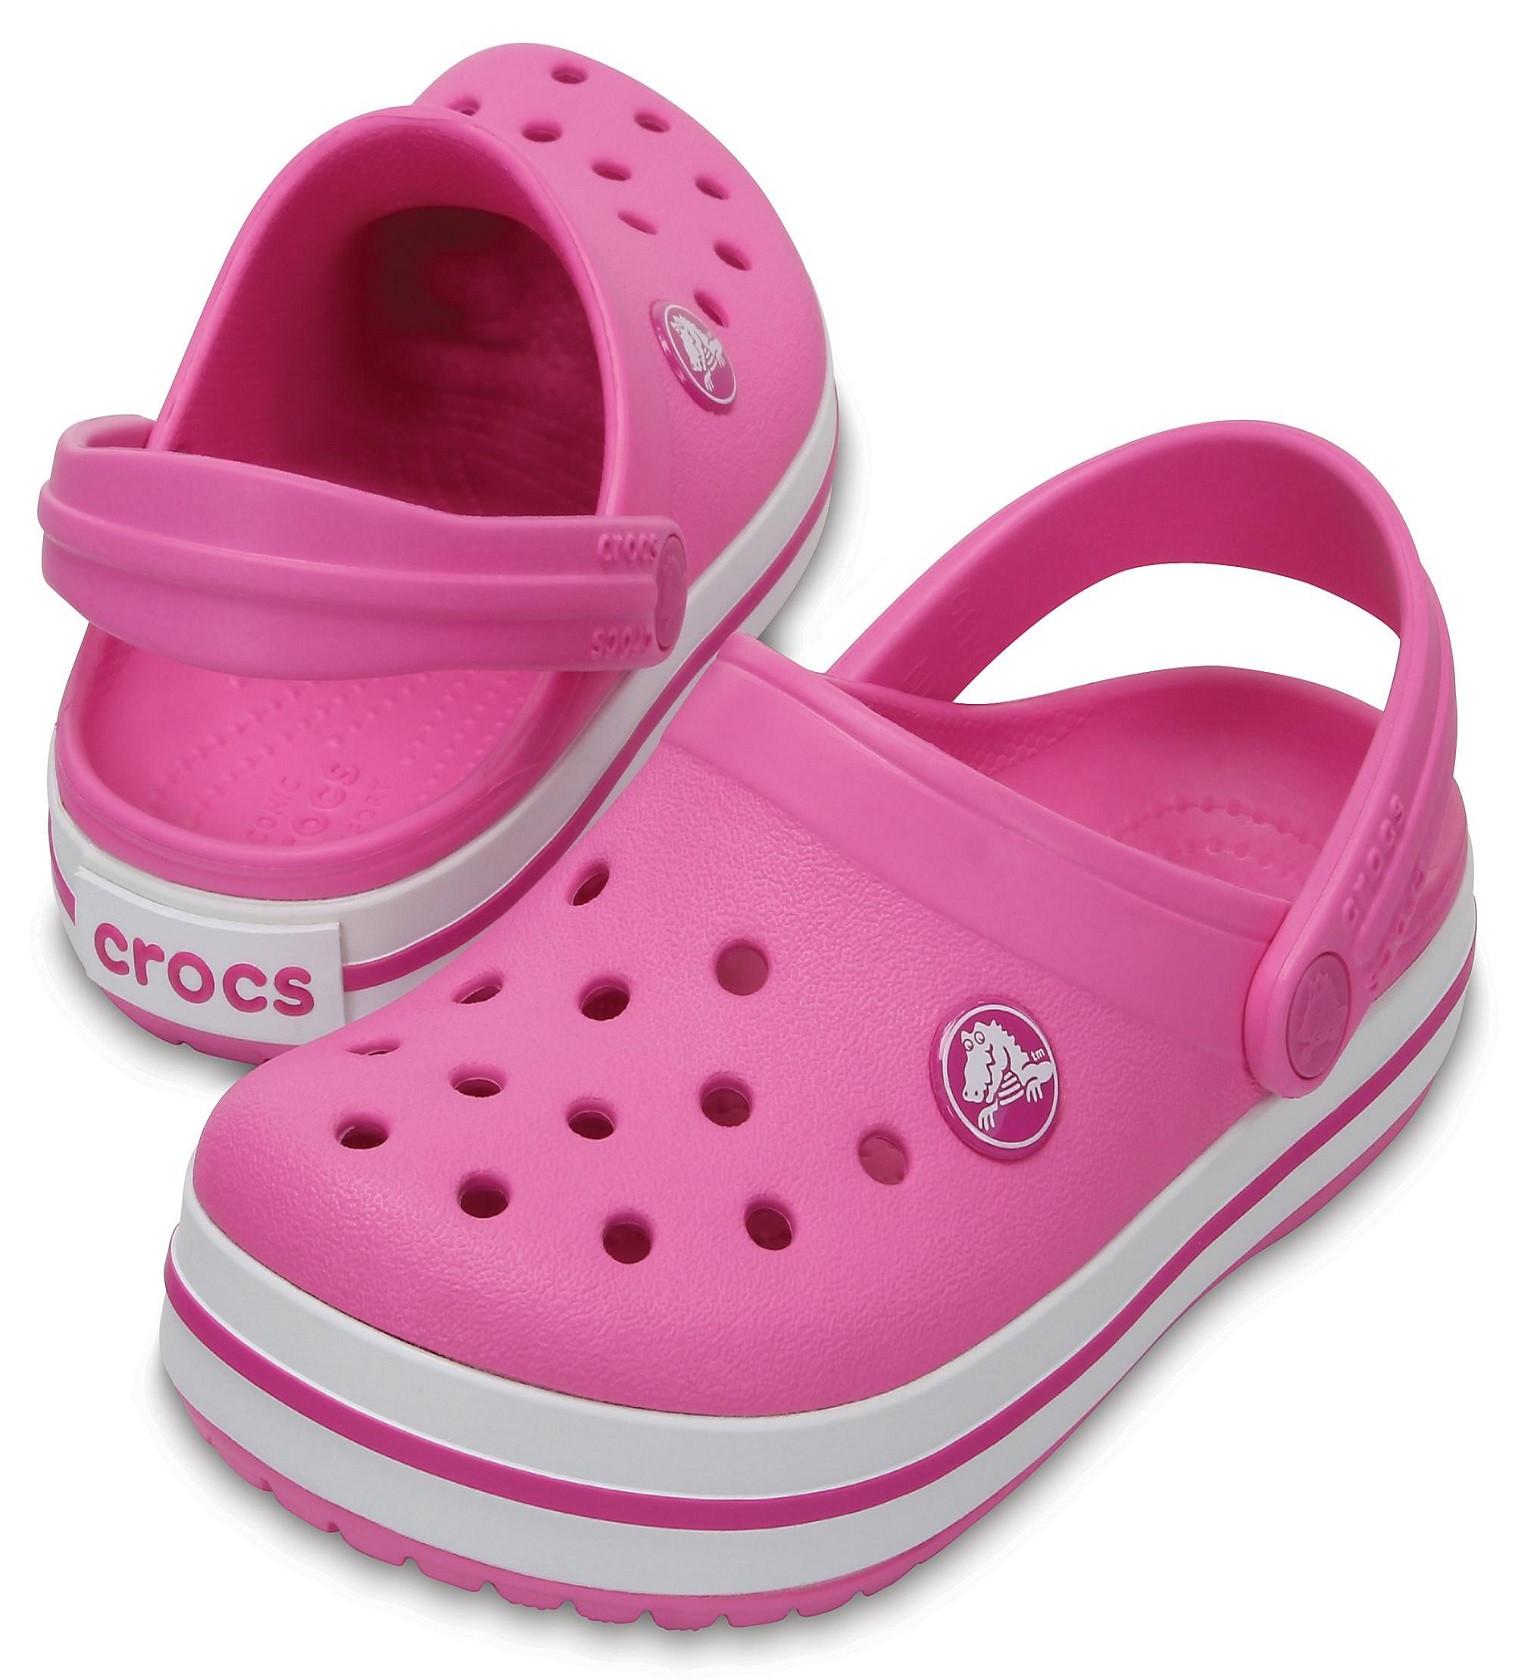 Купити Дитячі сабо Crocs Crocband™ Clog party pink - фото 1